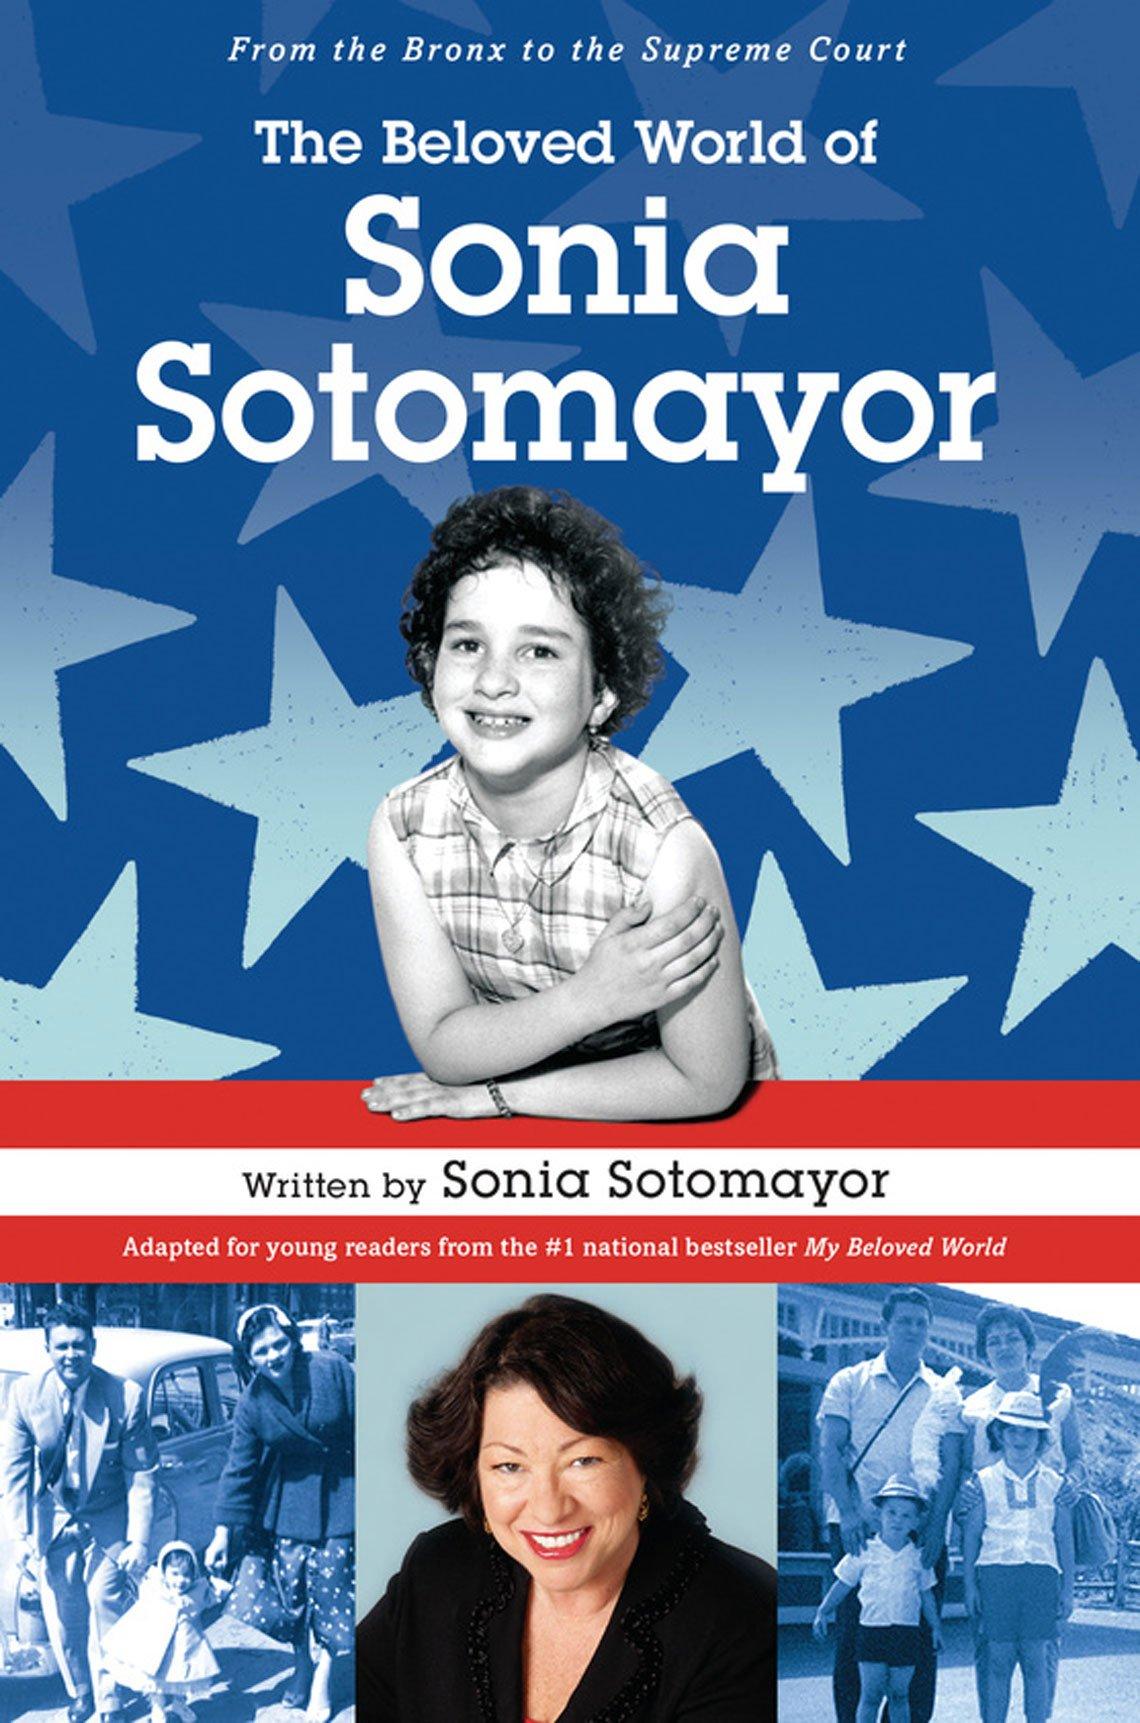 Carátula del libro de Sonia Sotomayor